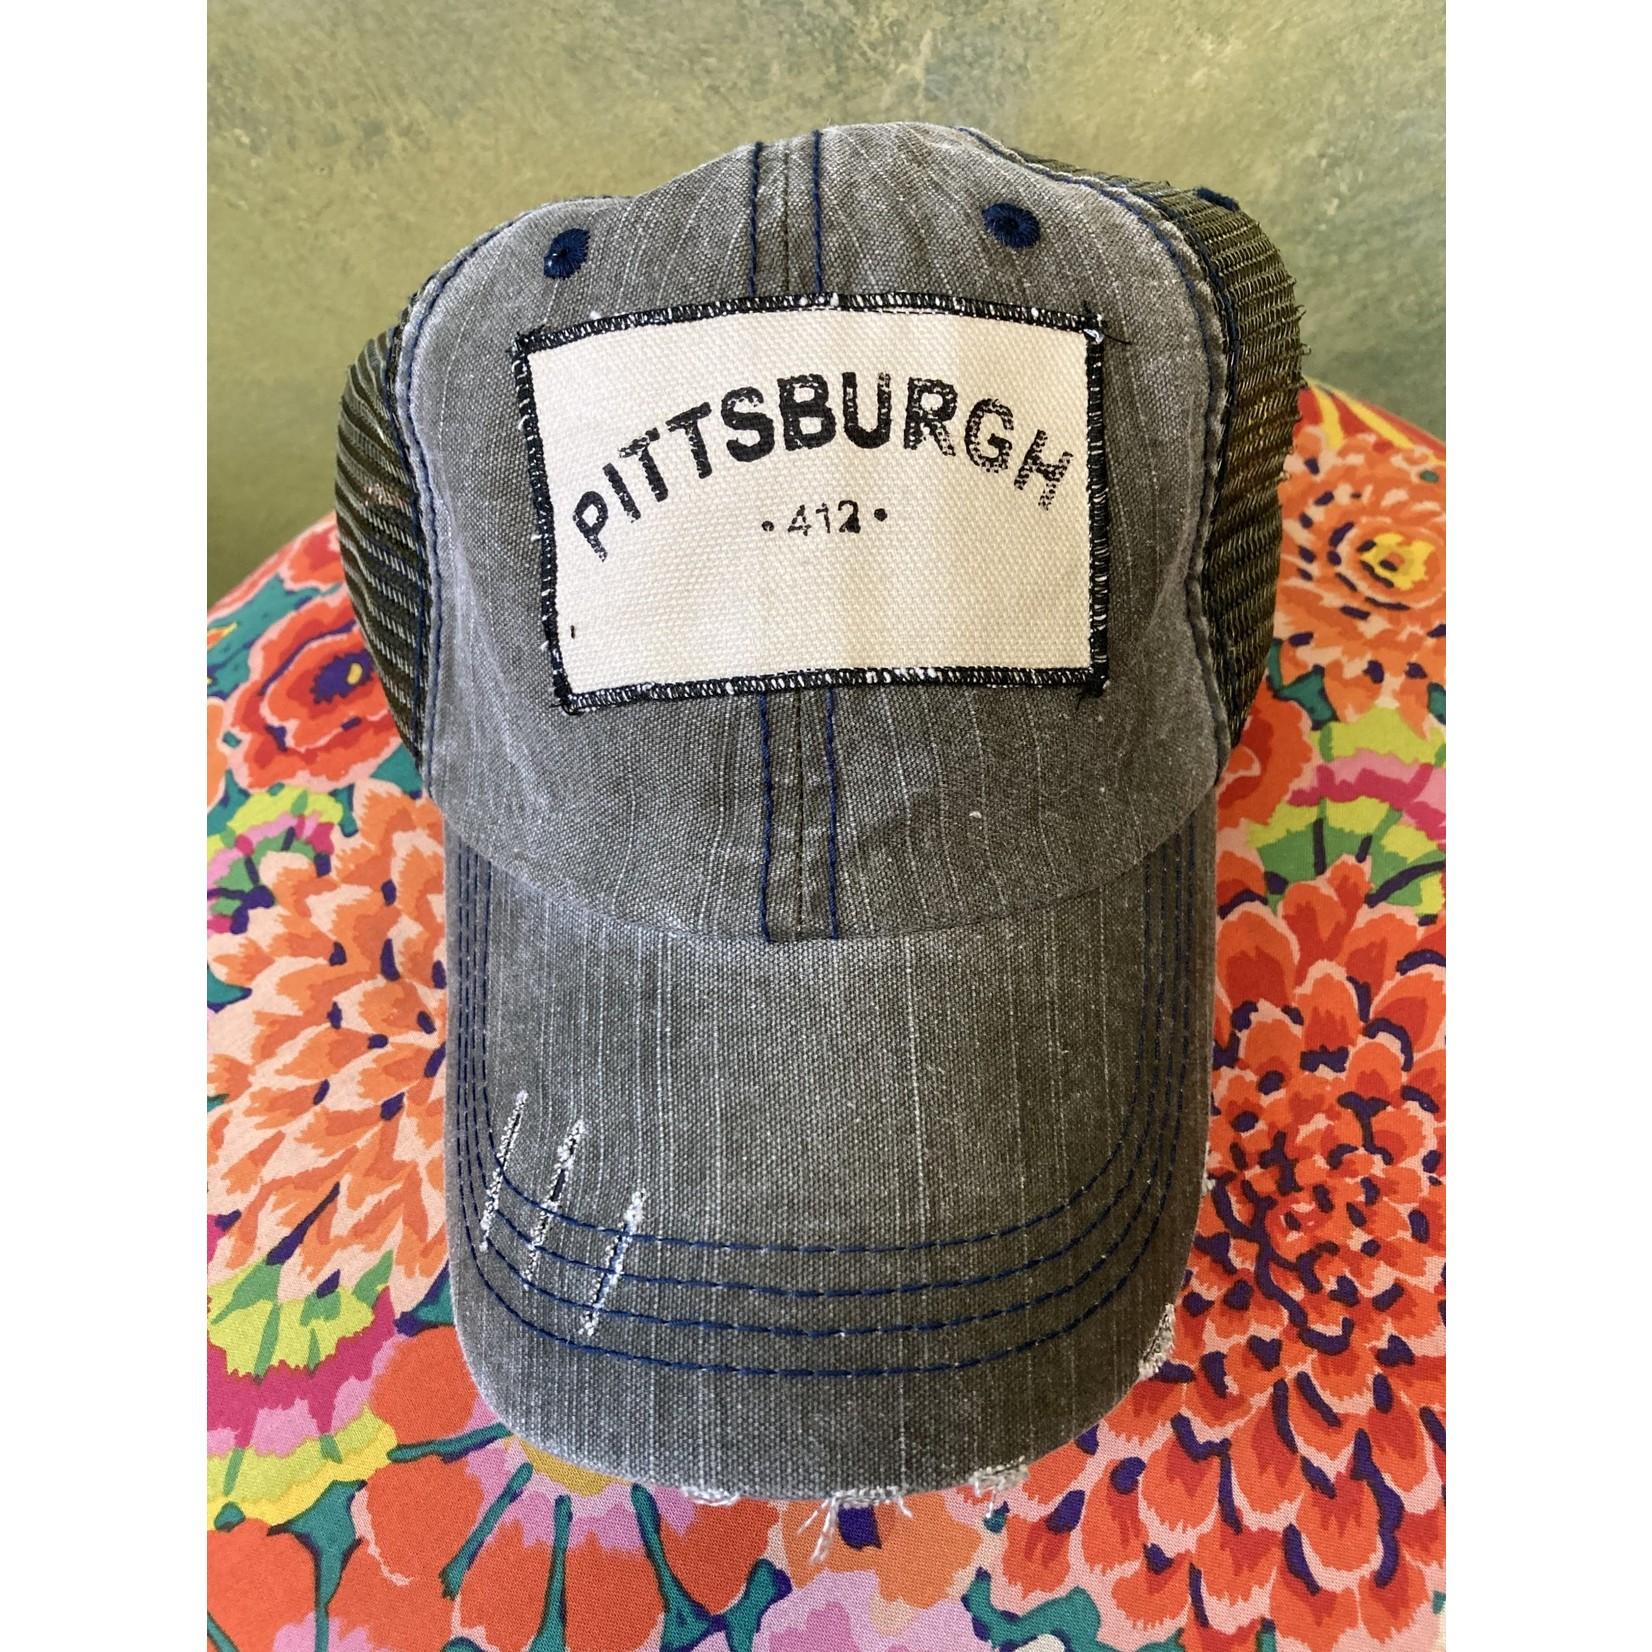 S & J Decor S & J Decor   Pittsburgh Trucker Hat - 412 denim with green mesh